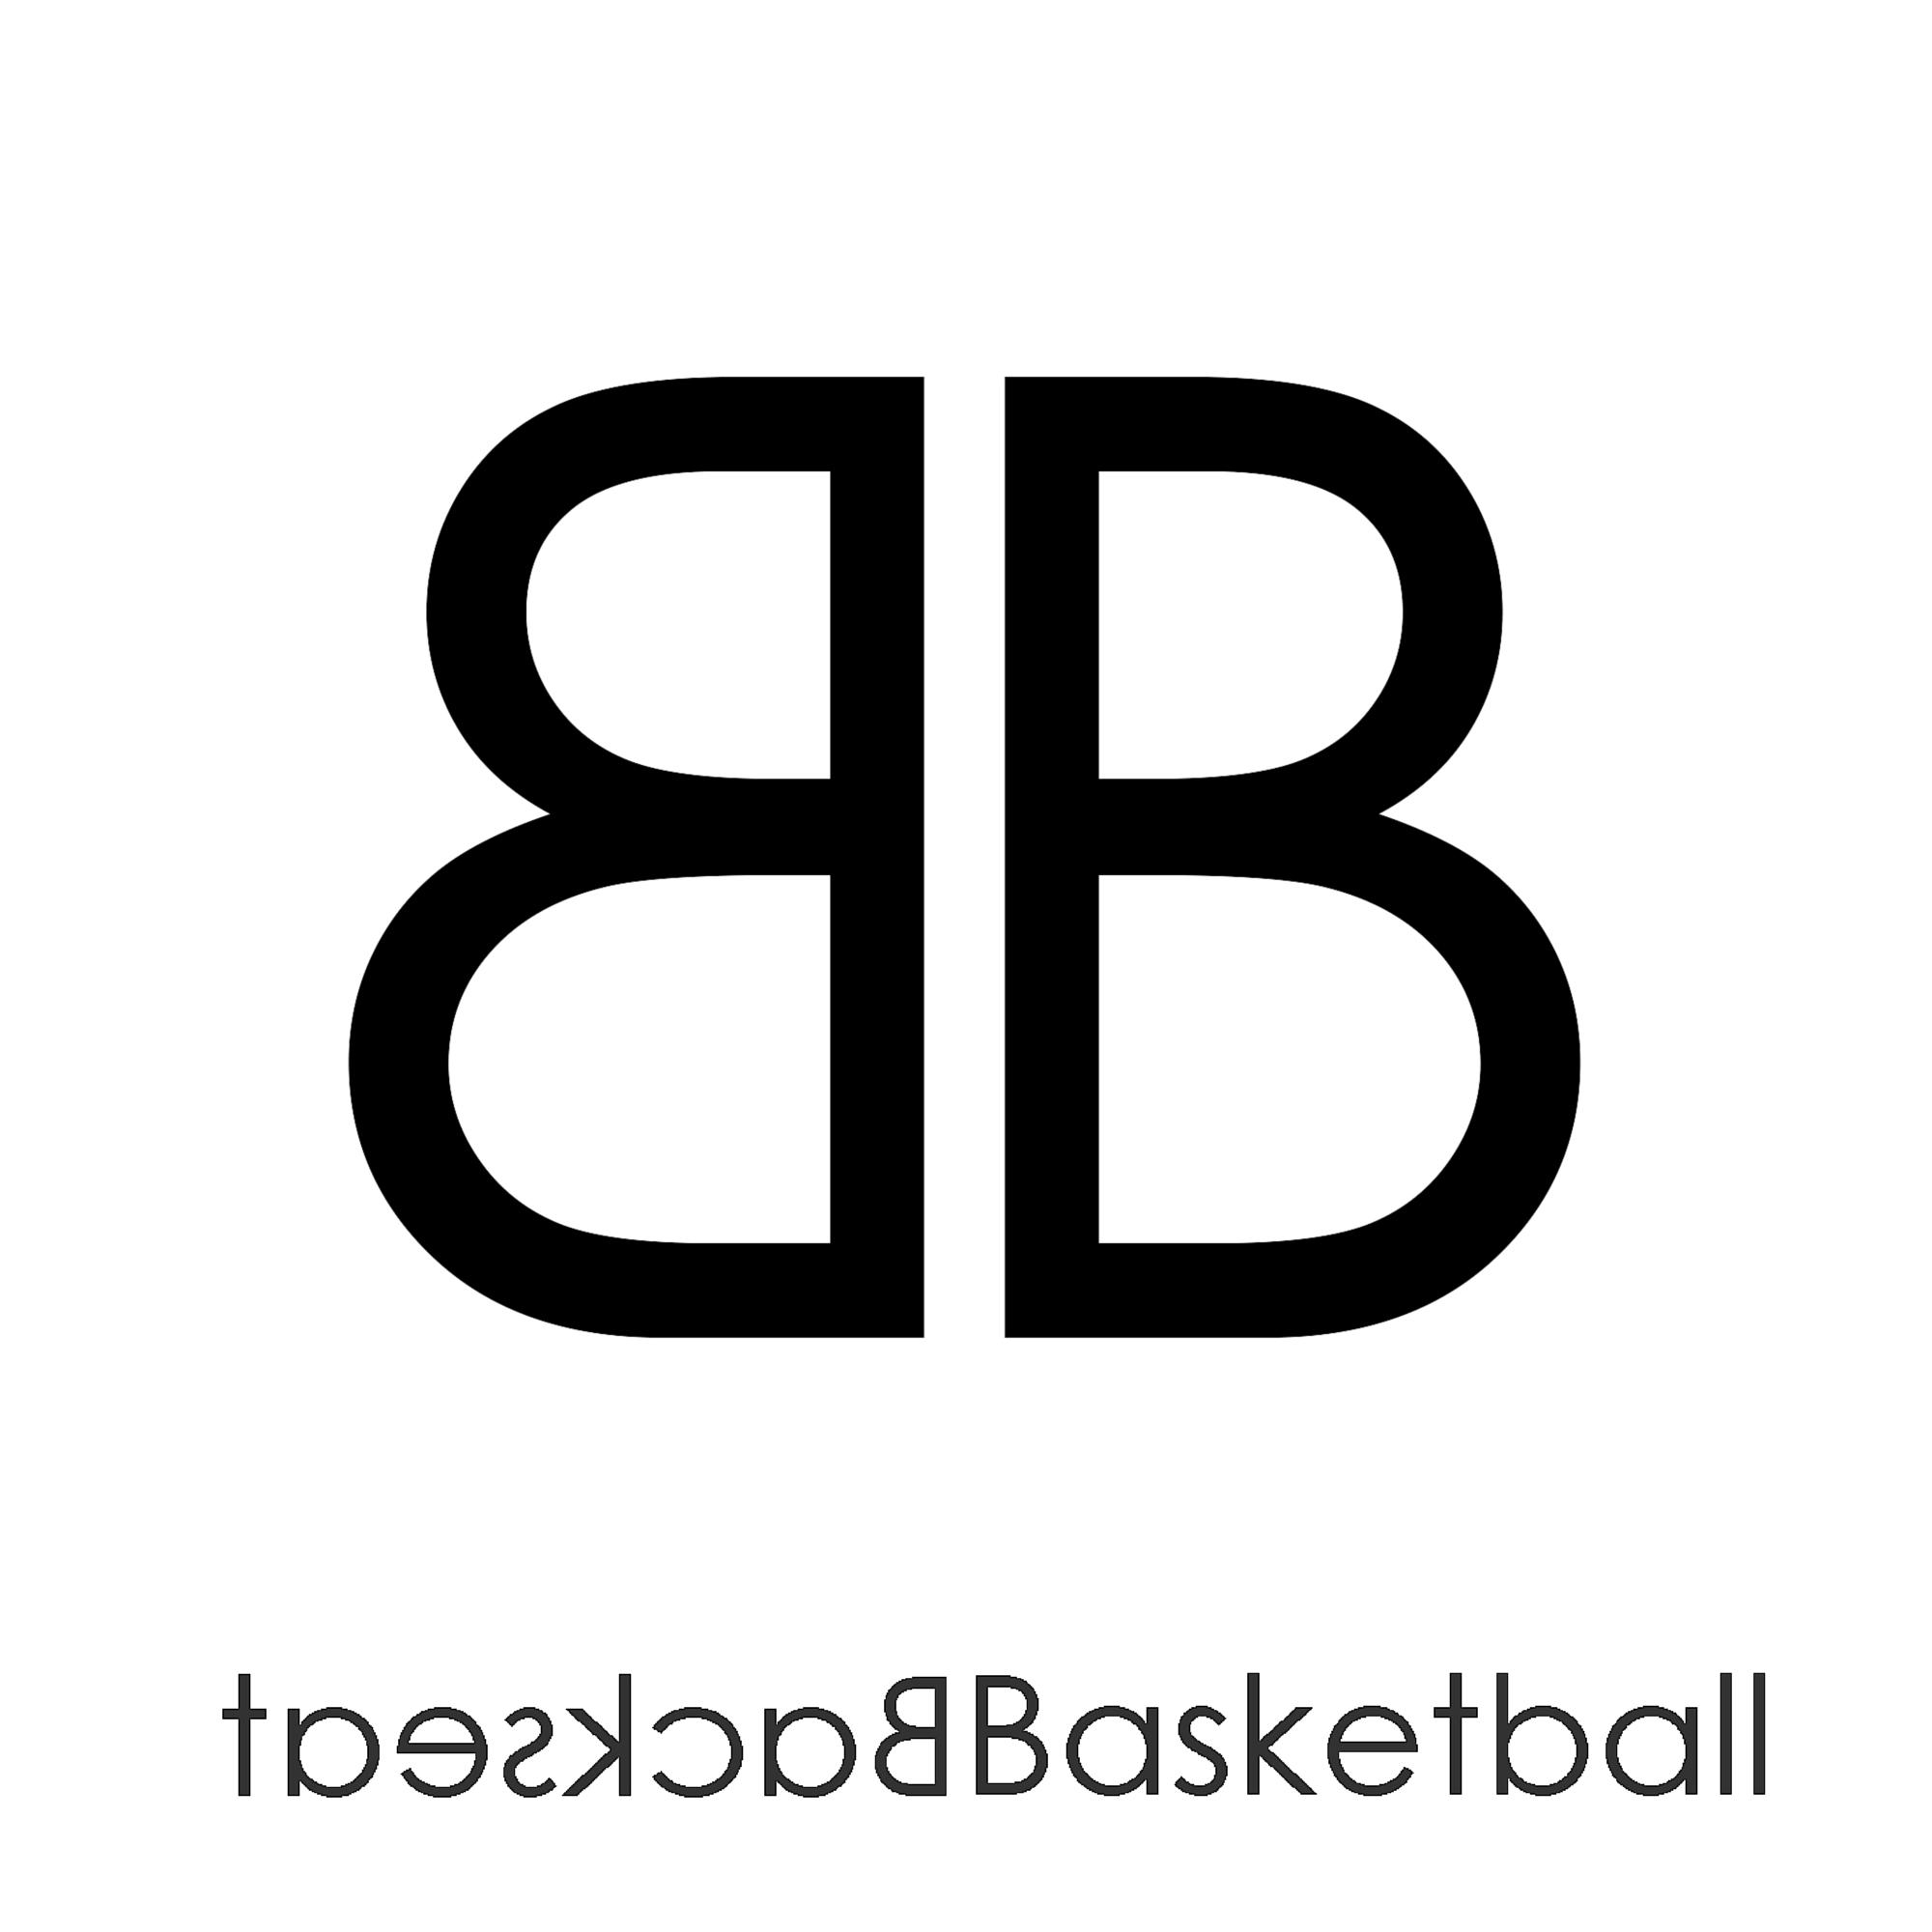 Backseat Basketball